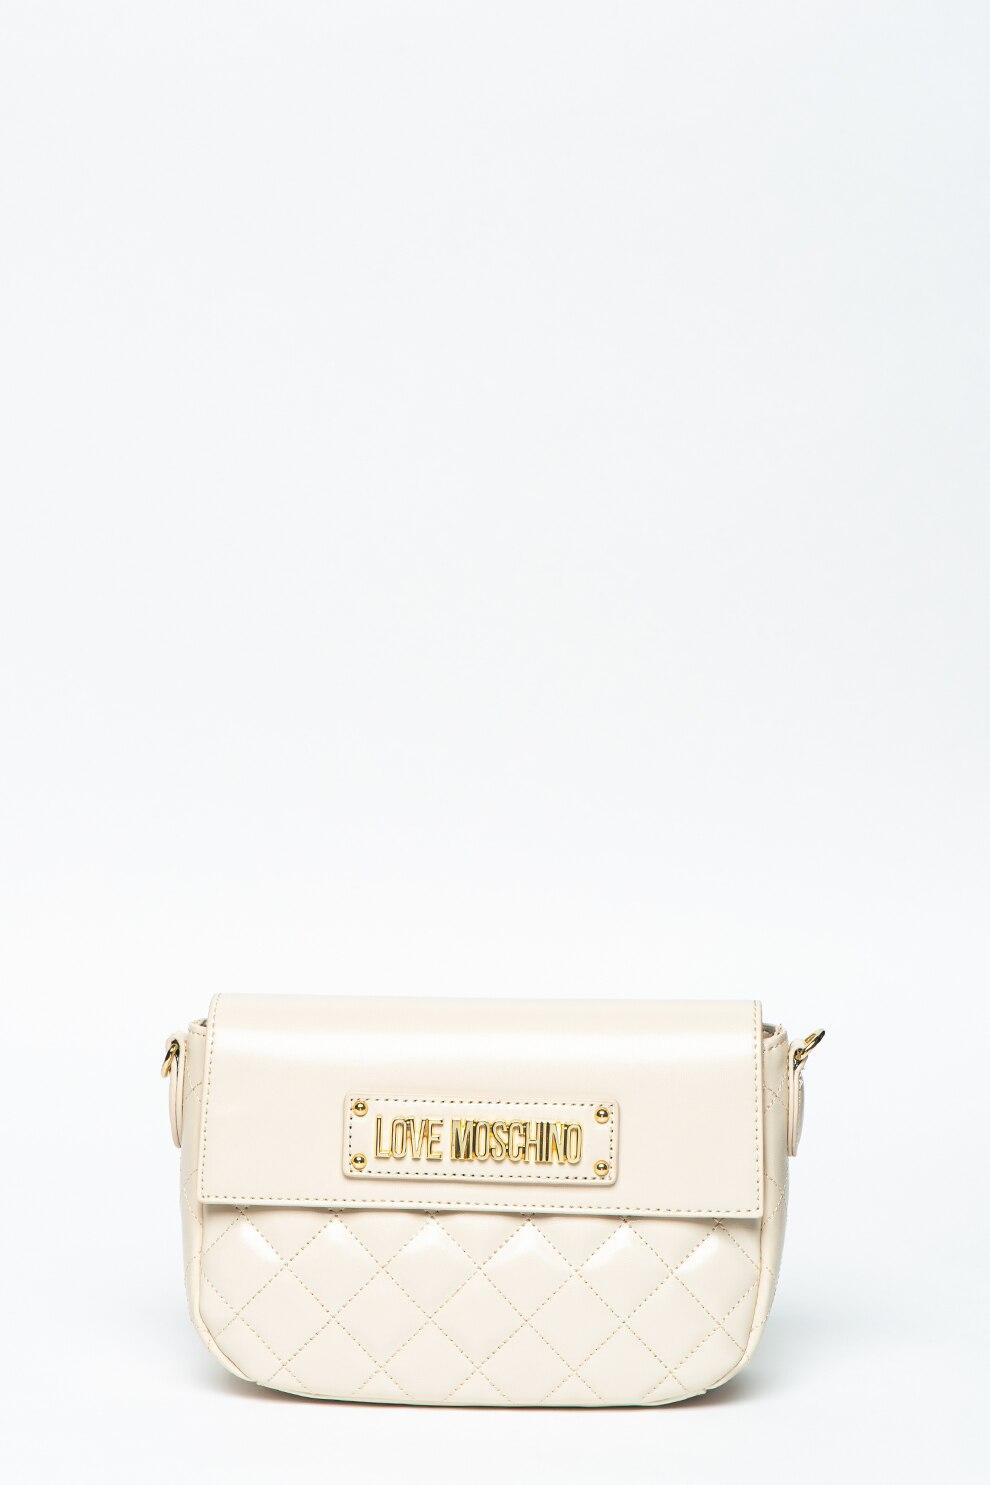 Fotografie Love Moschino, Geanta crossbody de piele ecologica cu aspect matlasat, Alb fildes